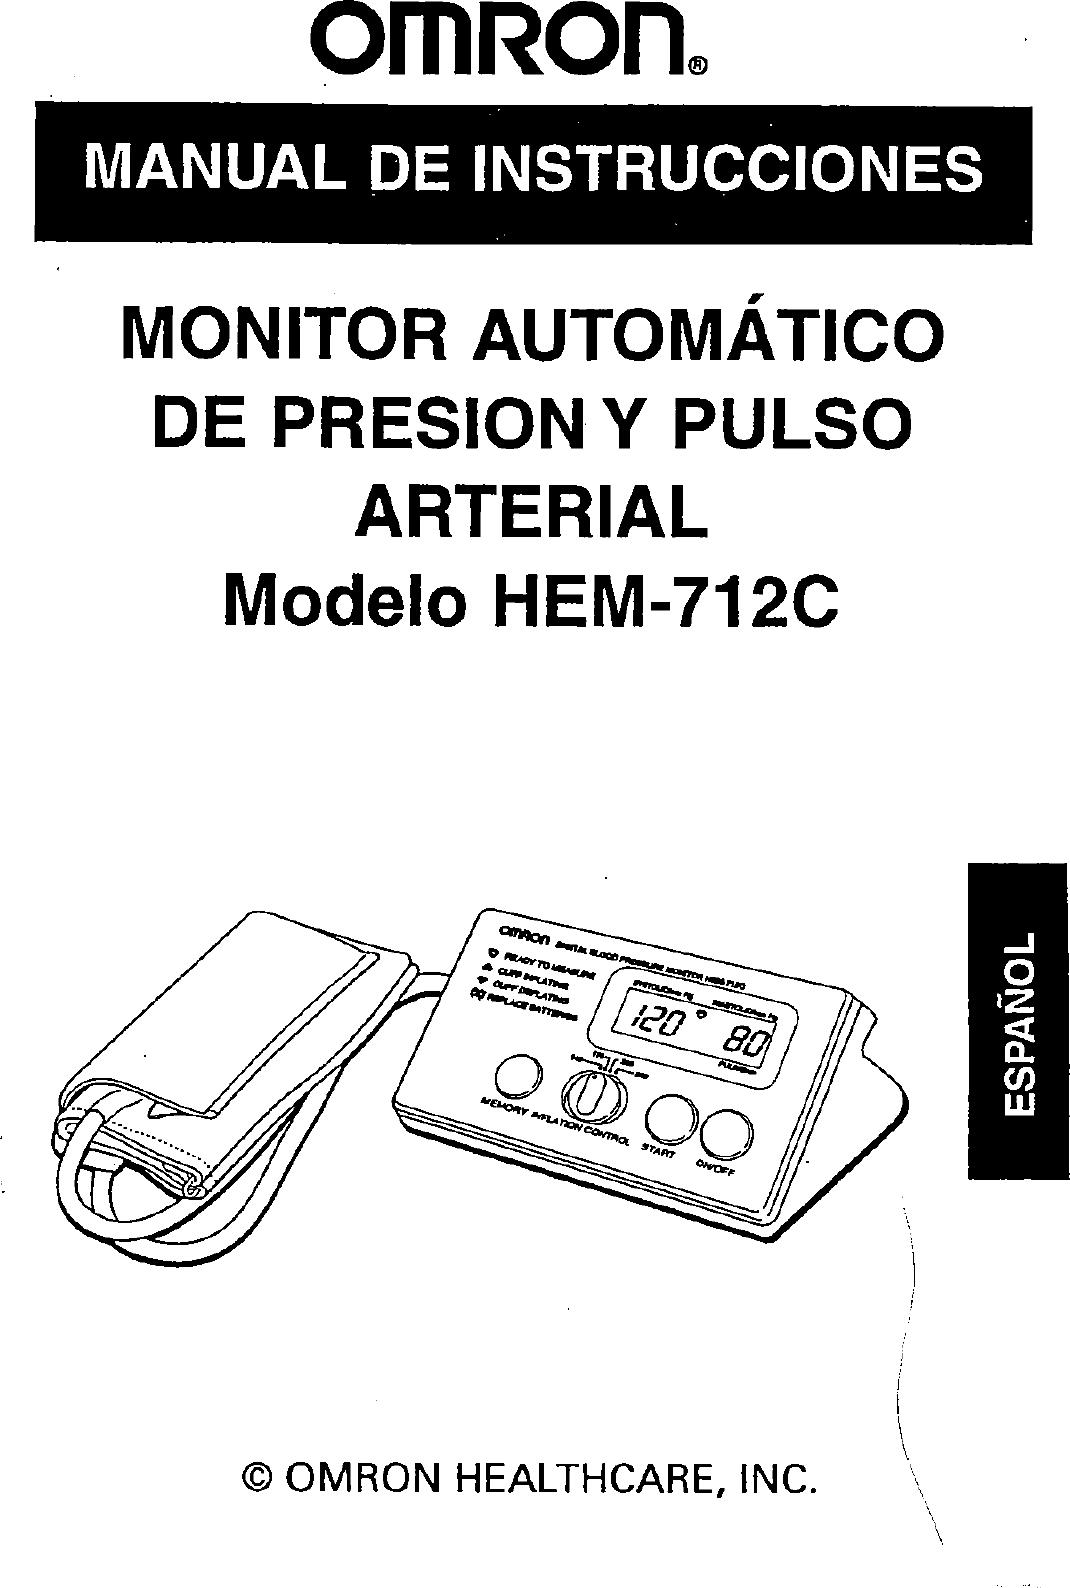 Omron Hem 712C Users Manual ManualsLib Makes It Easy To